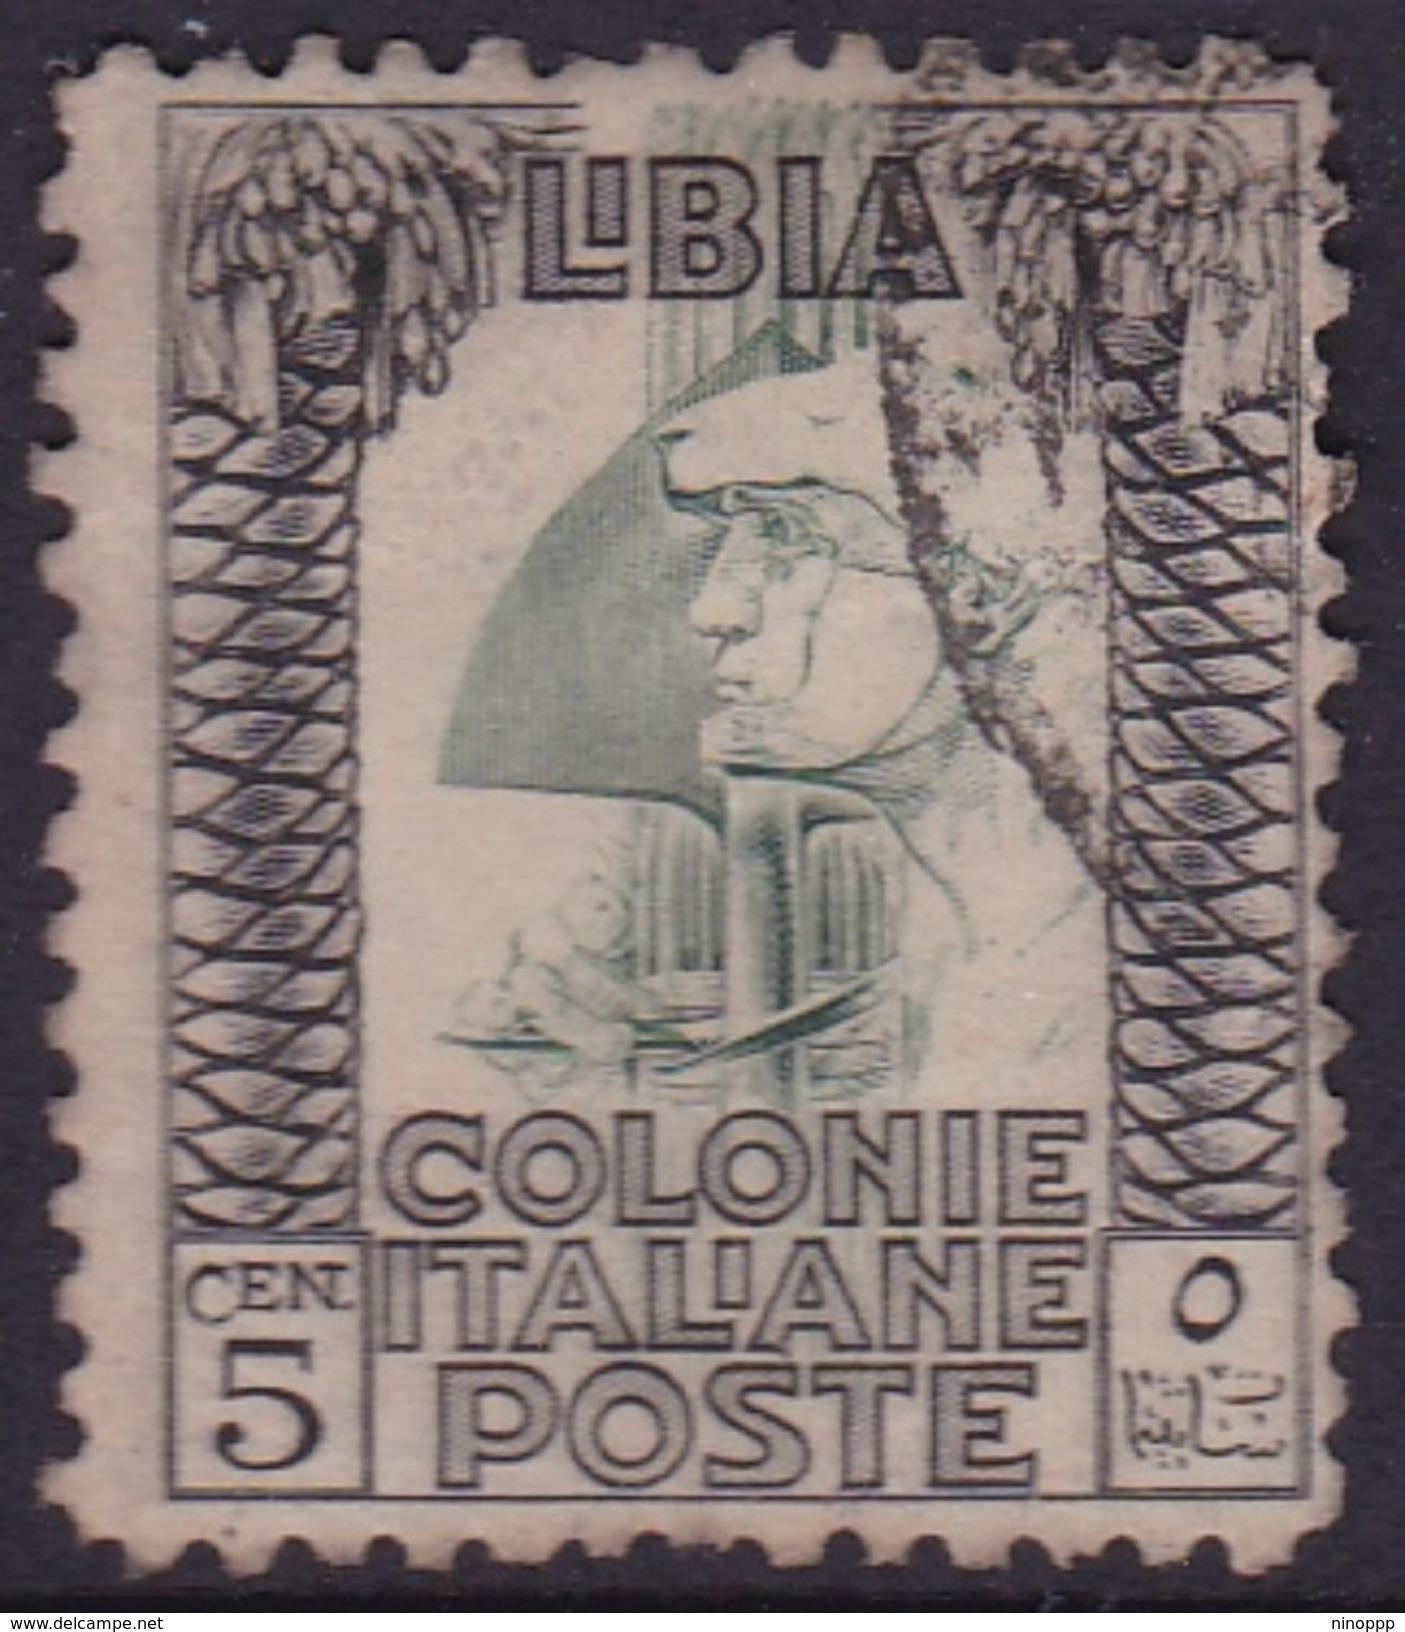 Italy-Colonies And Territories-Libya S 60 1926-30 ,roman Legionary,perf 11,5c ,used - Libya